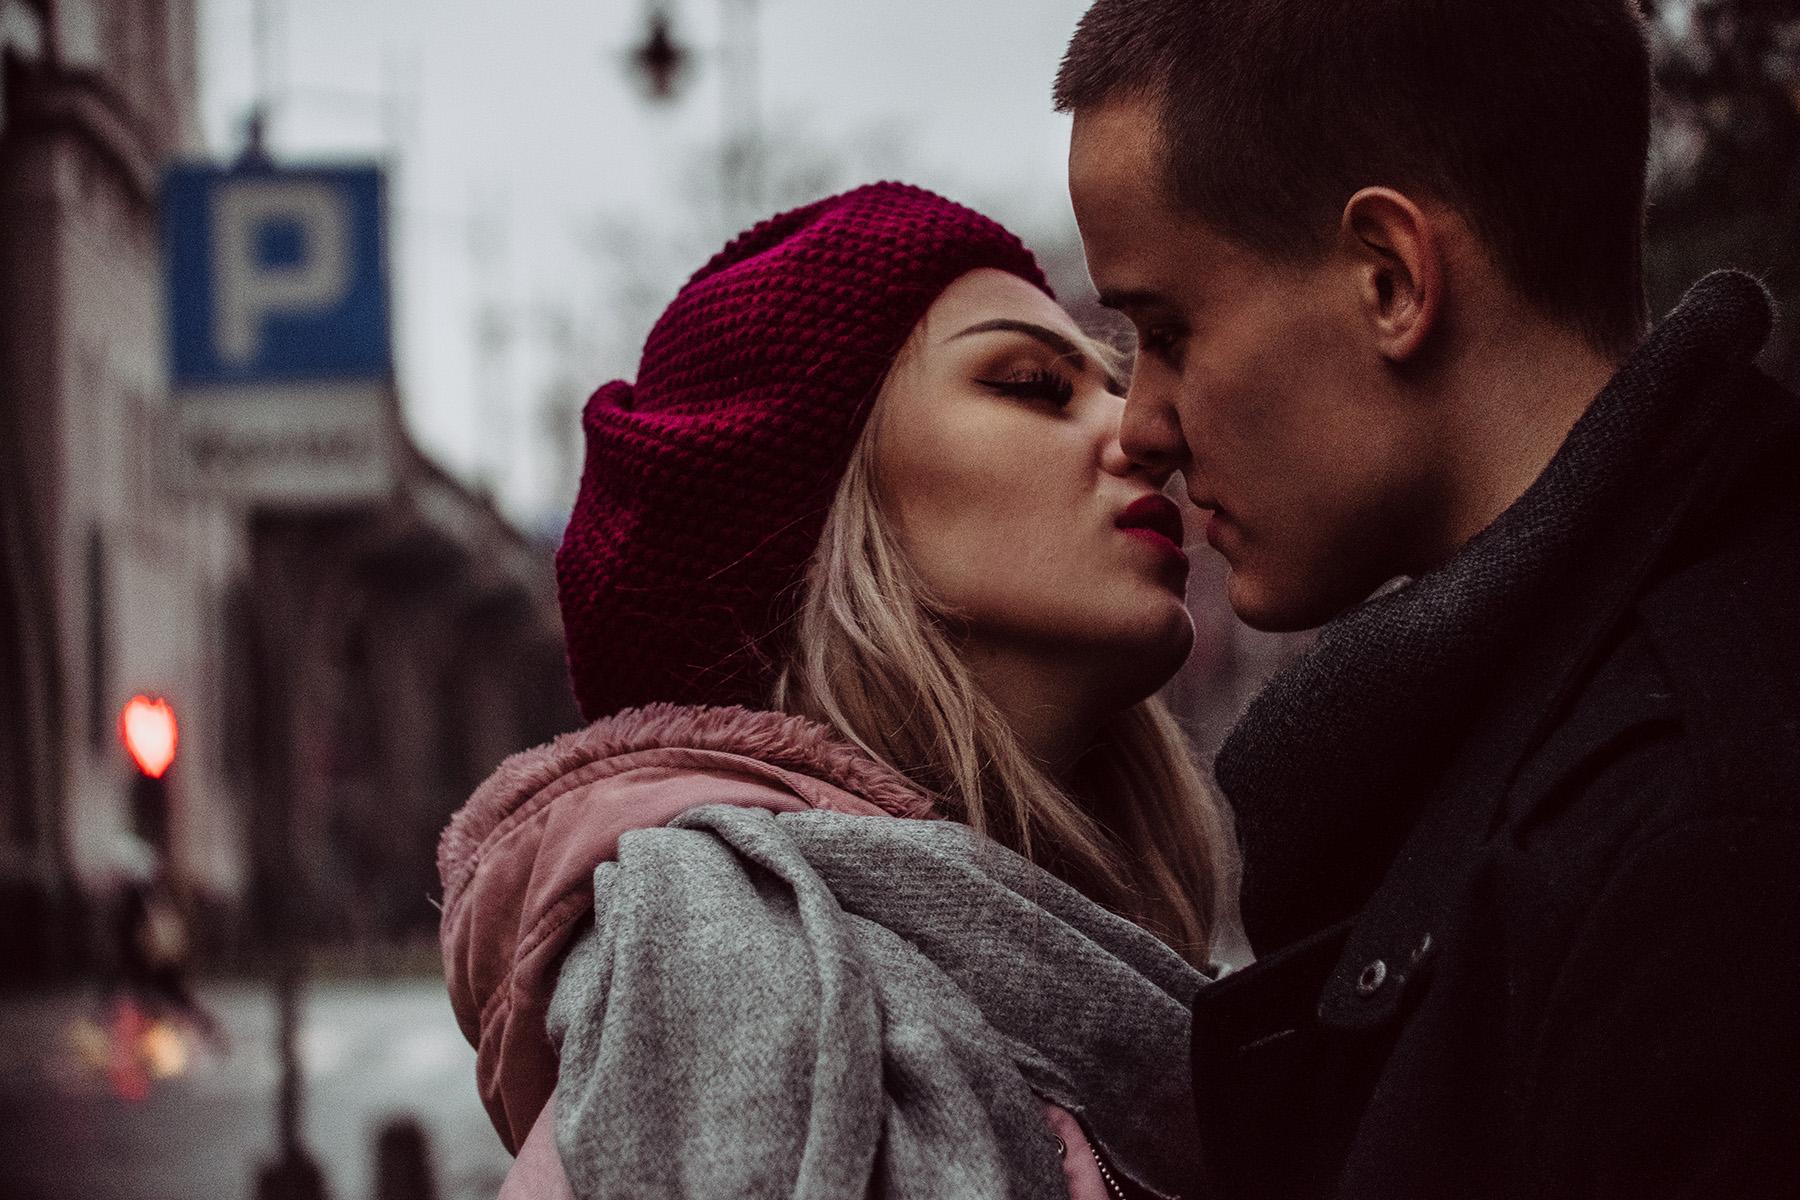 Romantic couple on street